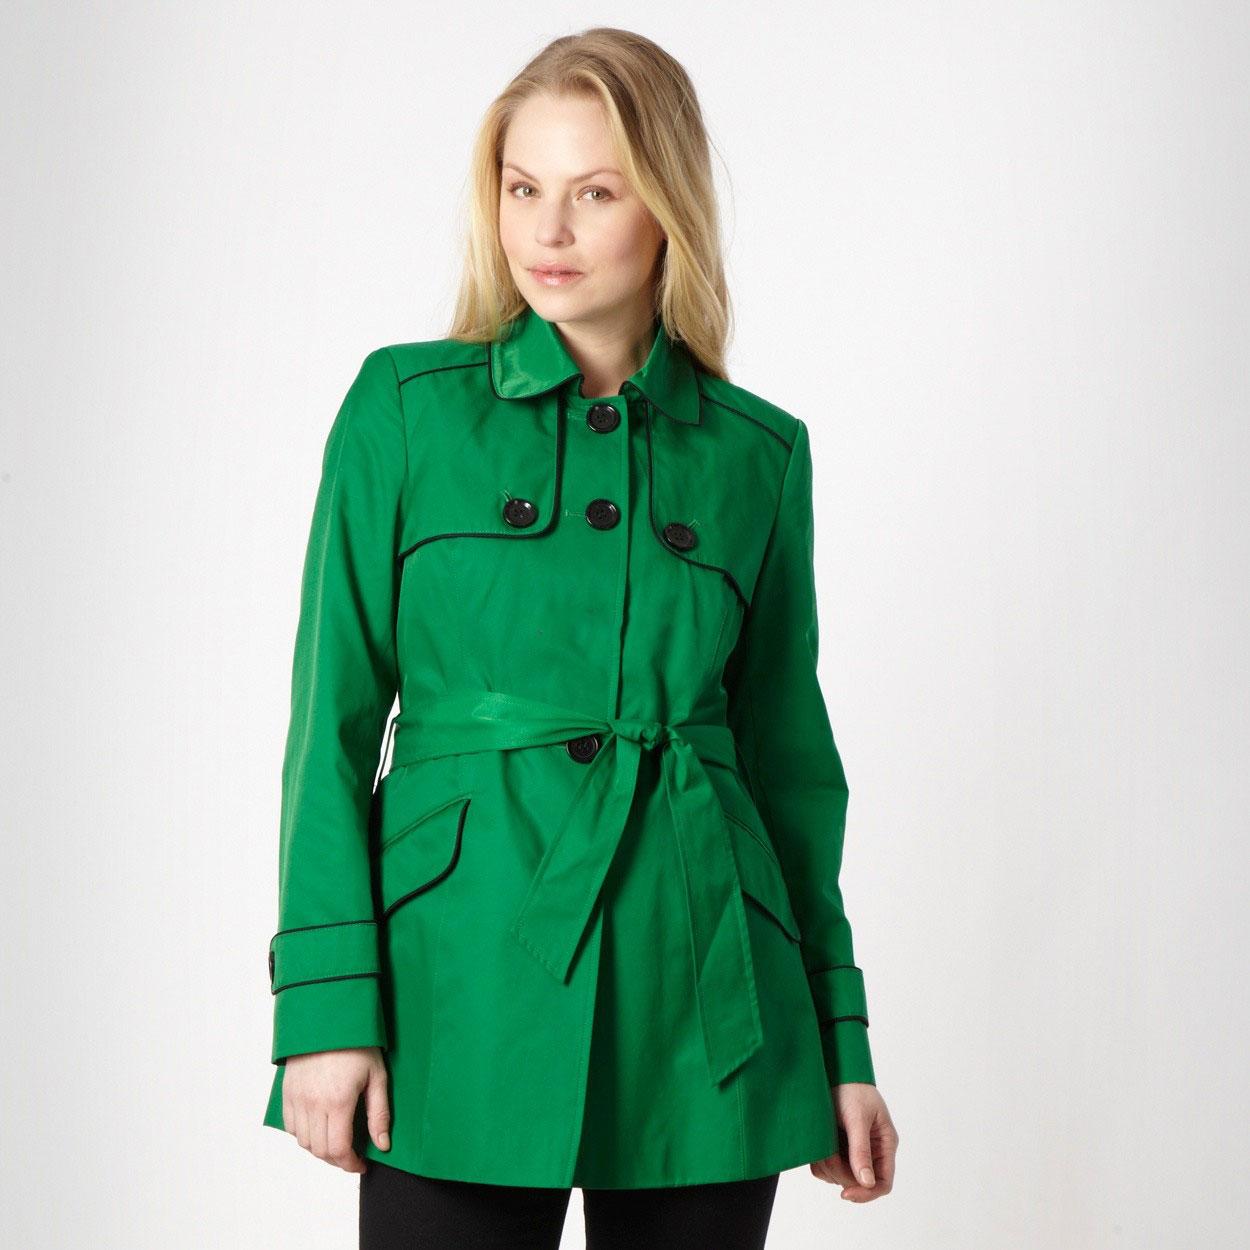 مدل مانتو سبز رنگ 2013